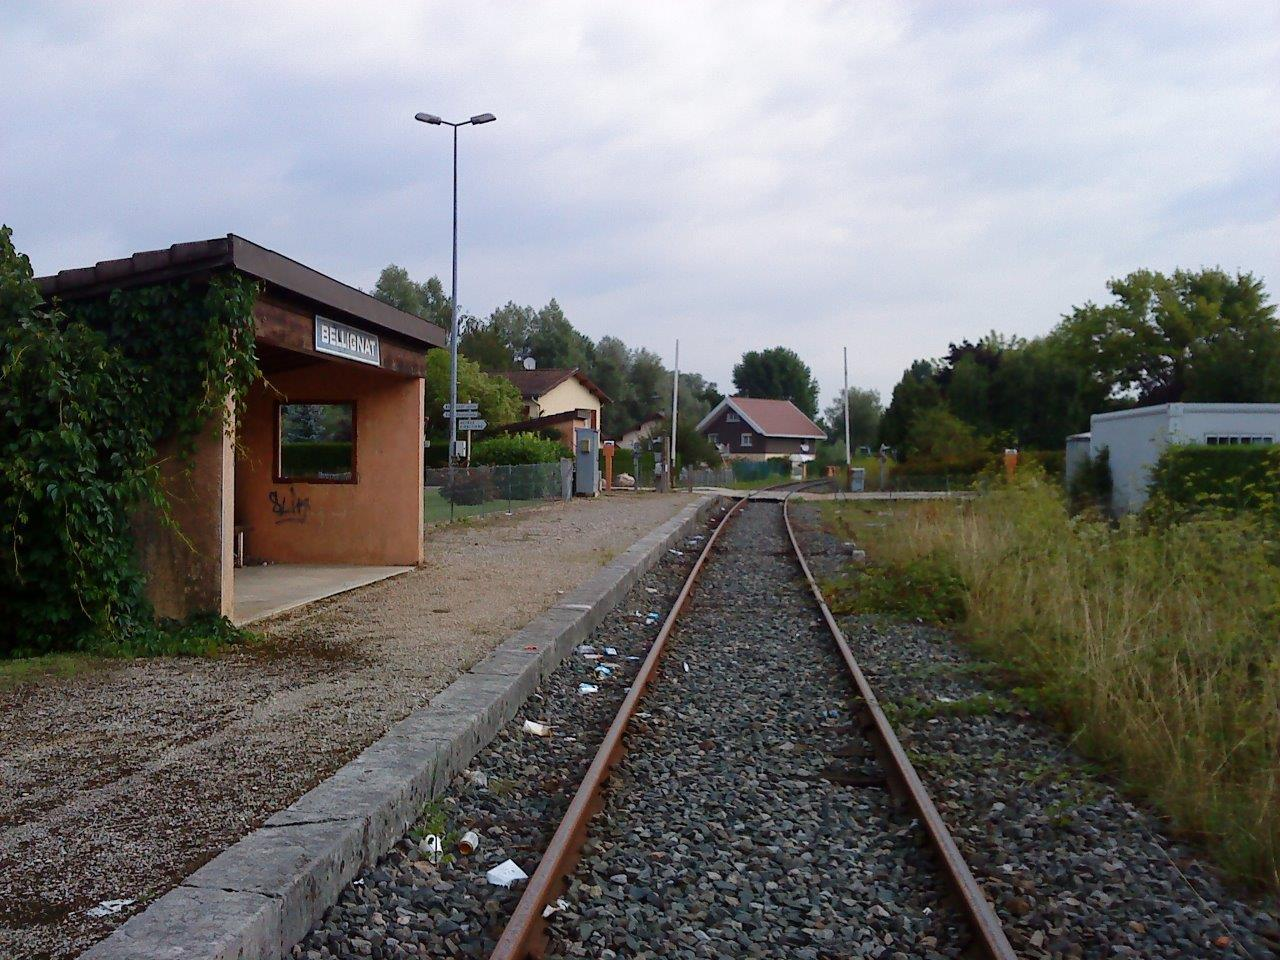 gare-de-bellignat-train-station